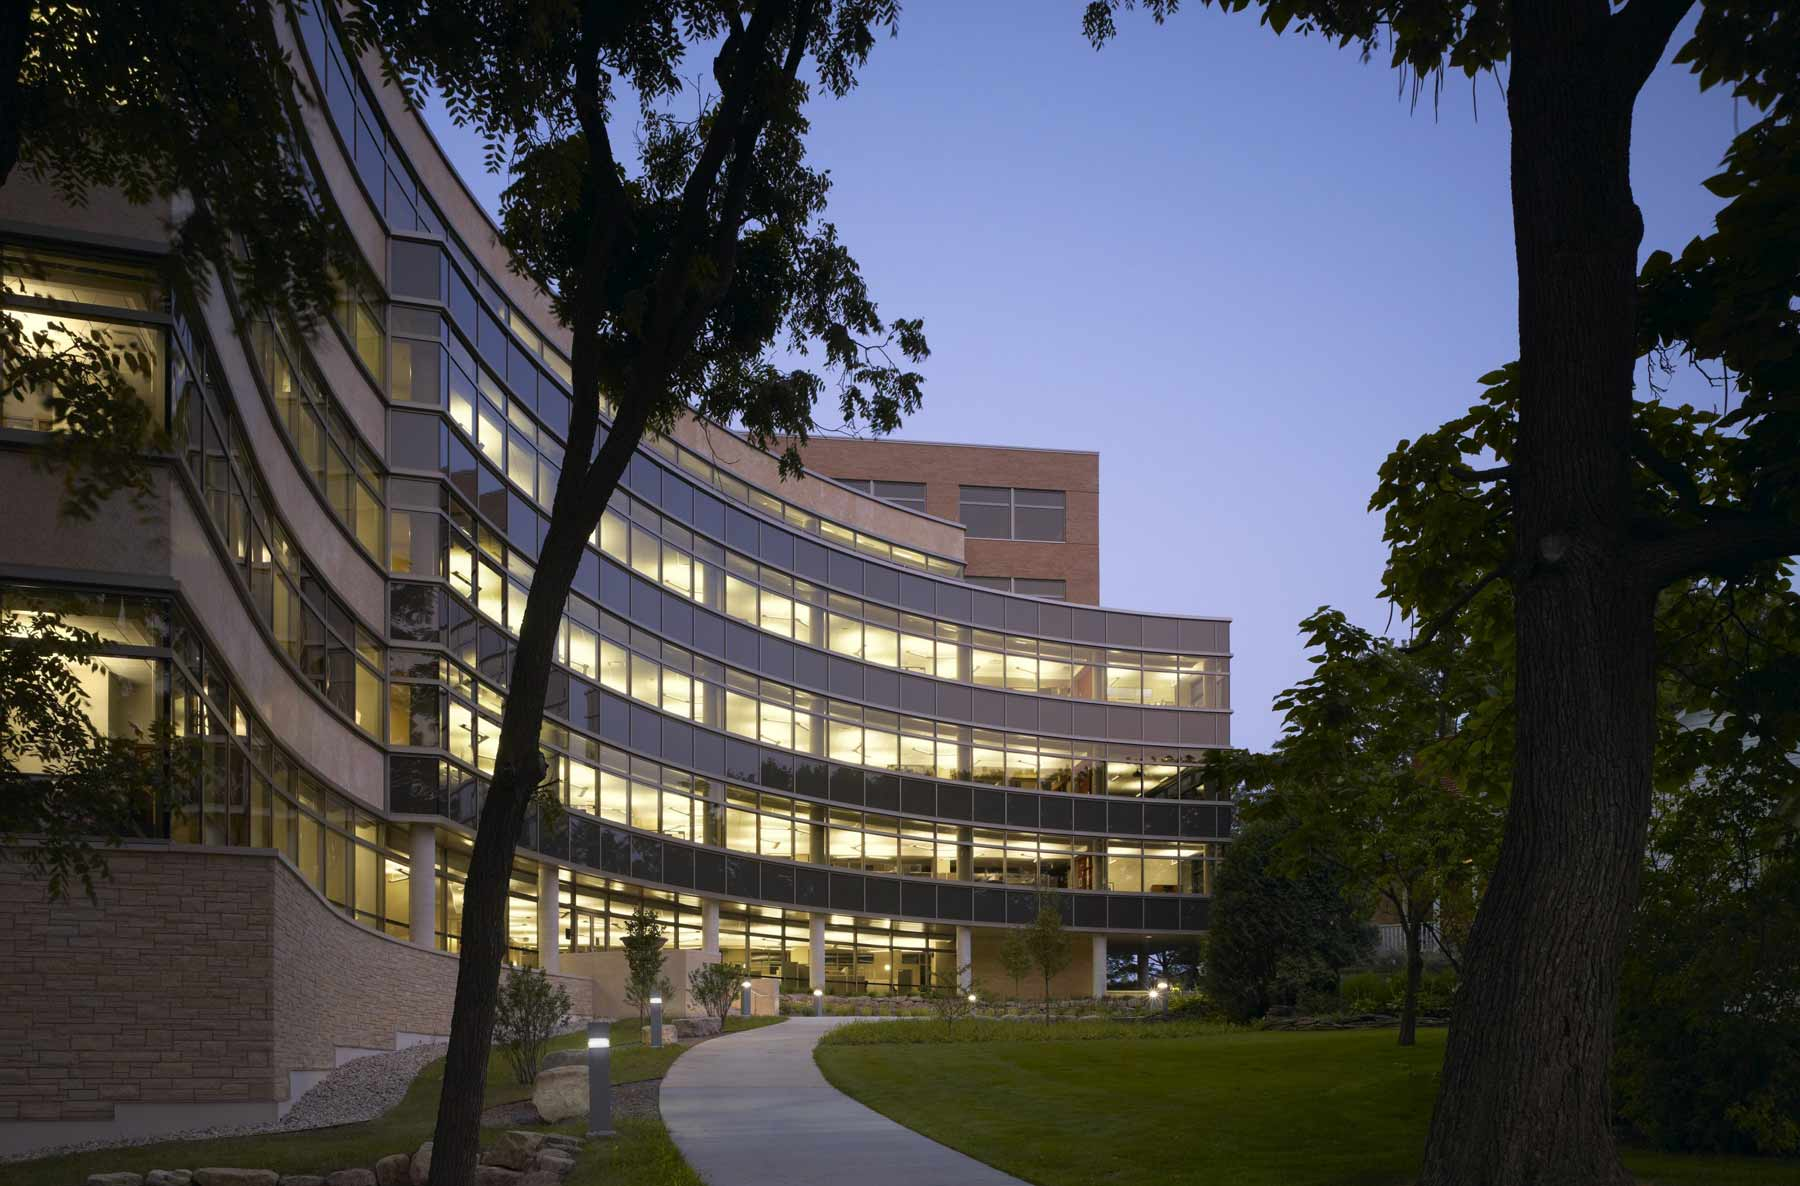 University of Wisconsin Medical Foundation - Centennial Building